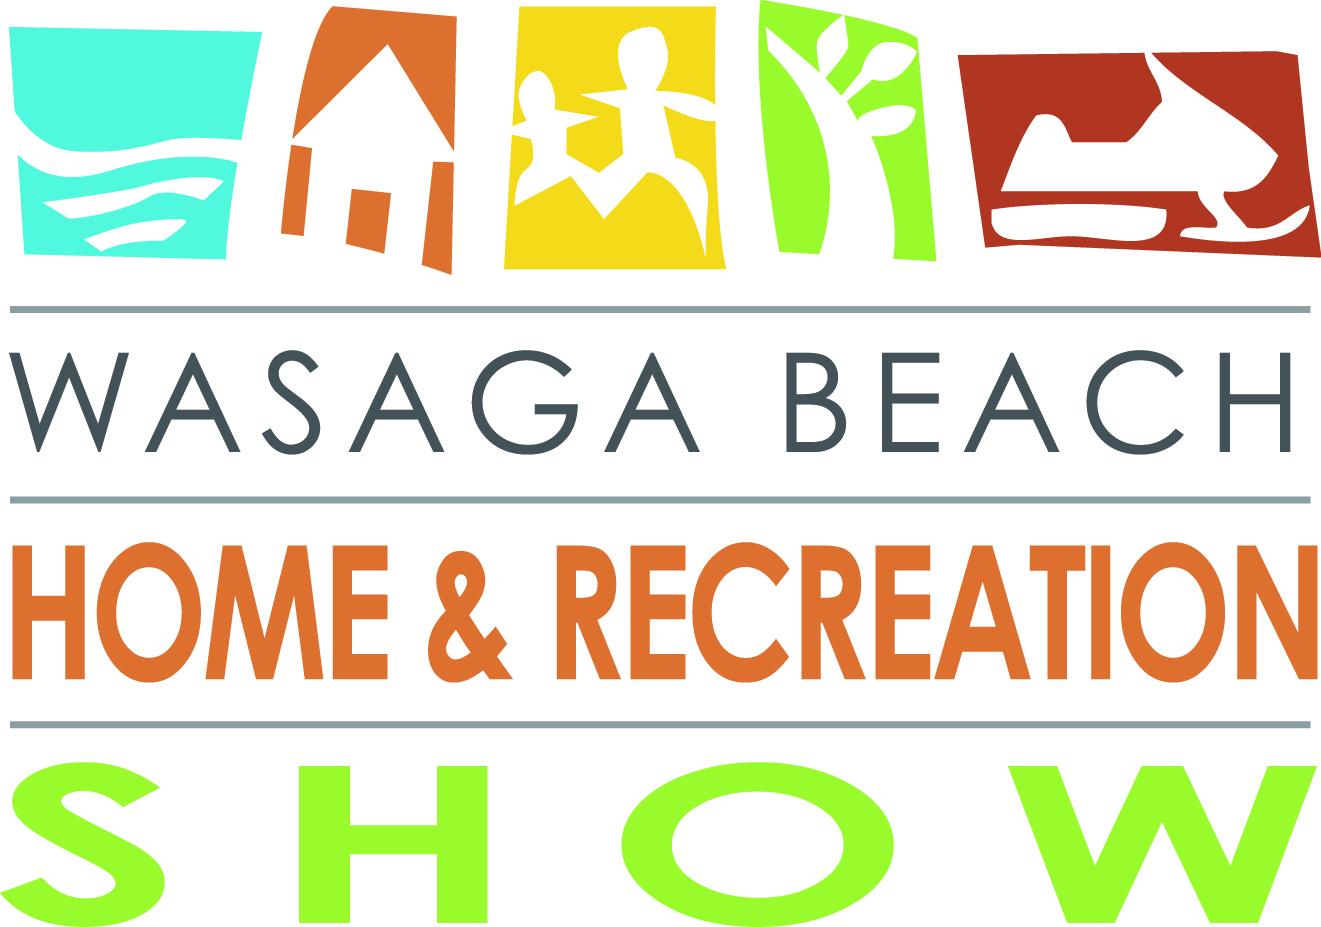 Beach Booster Wasaga Beach Home Recreation Show Coming